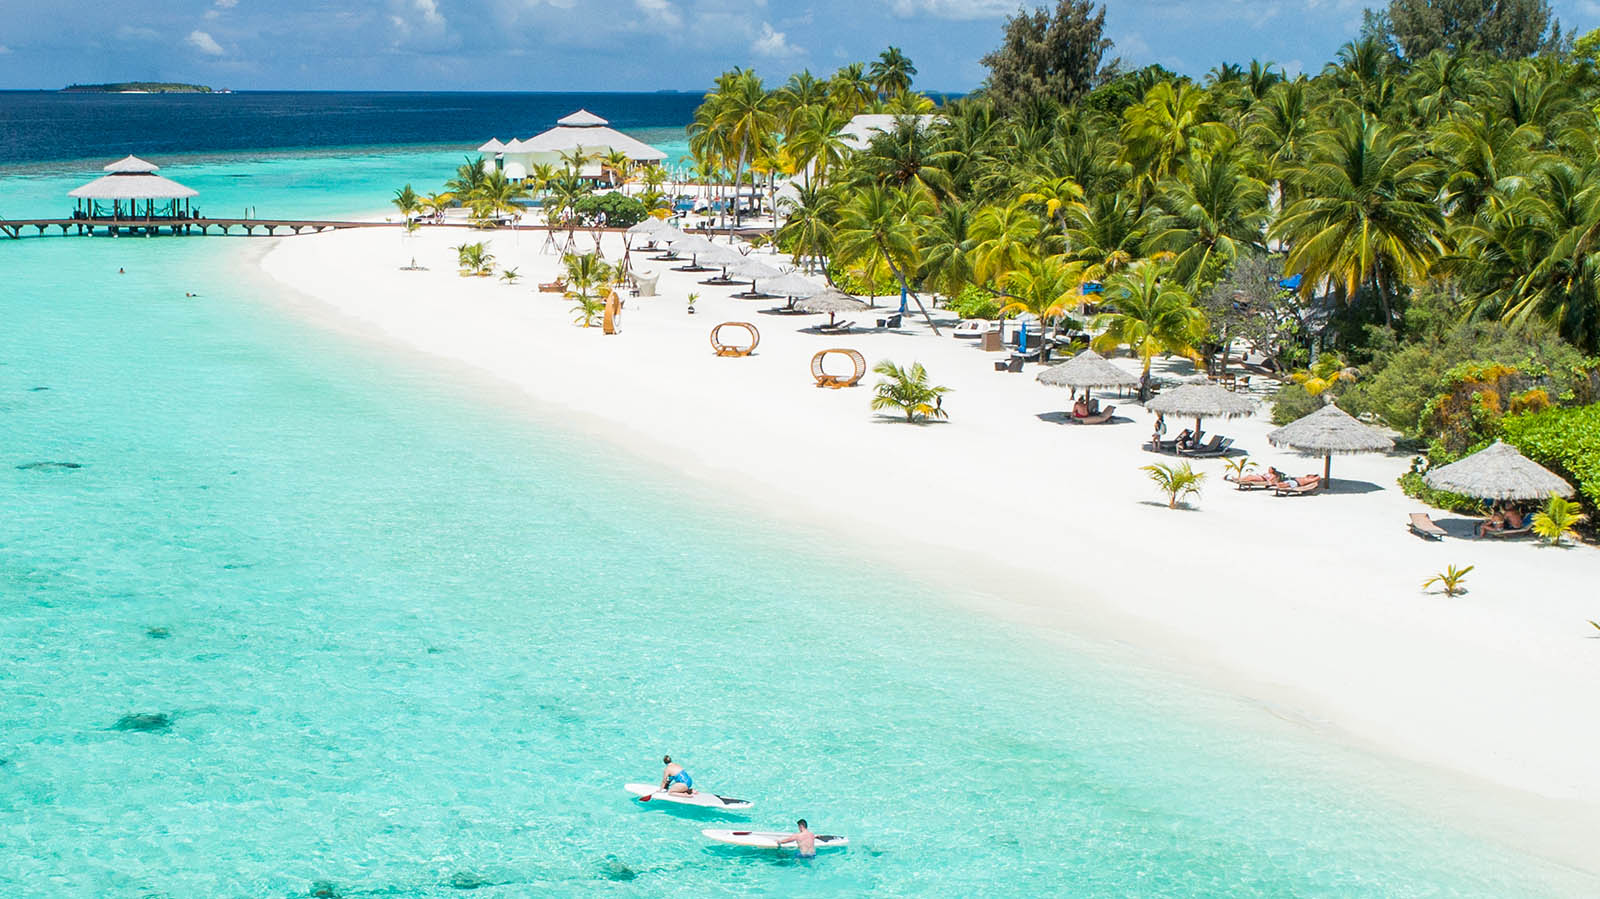 Kihaa Maldives Resort beach